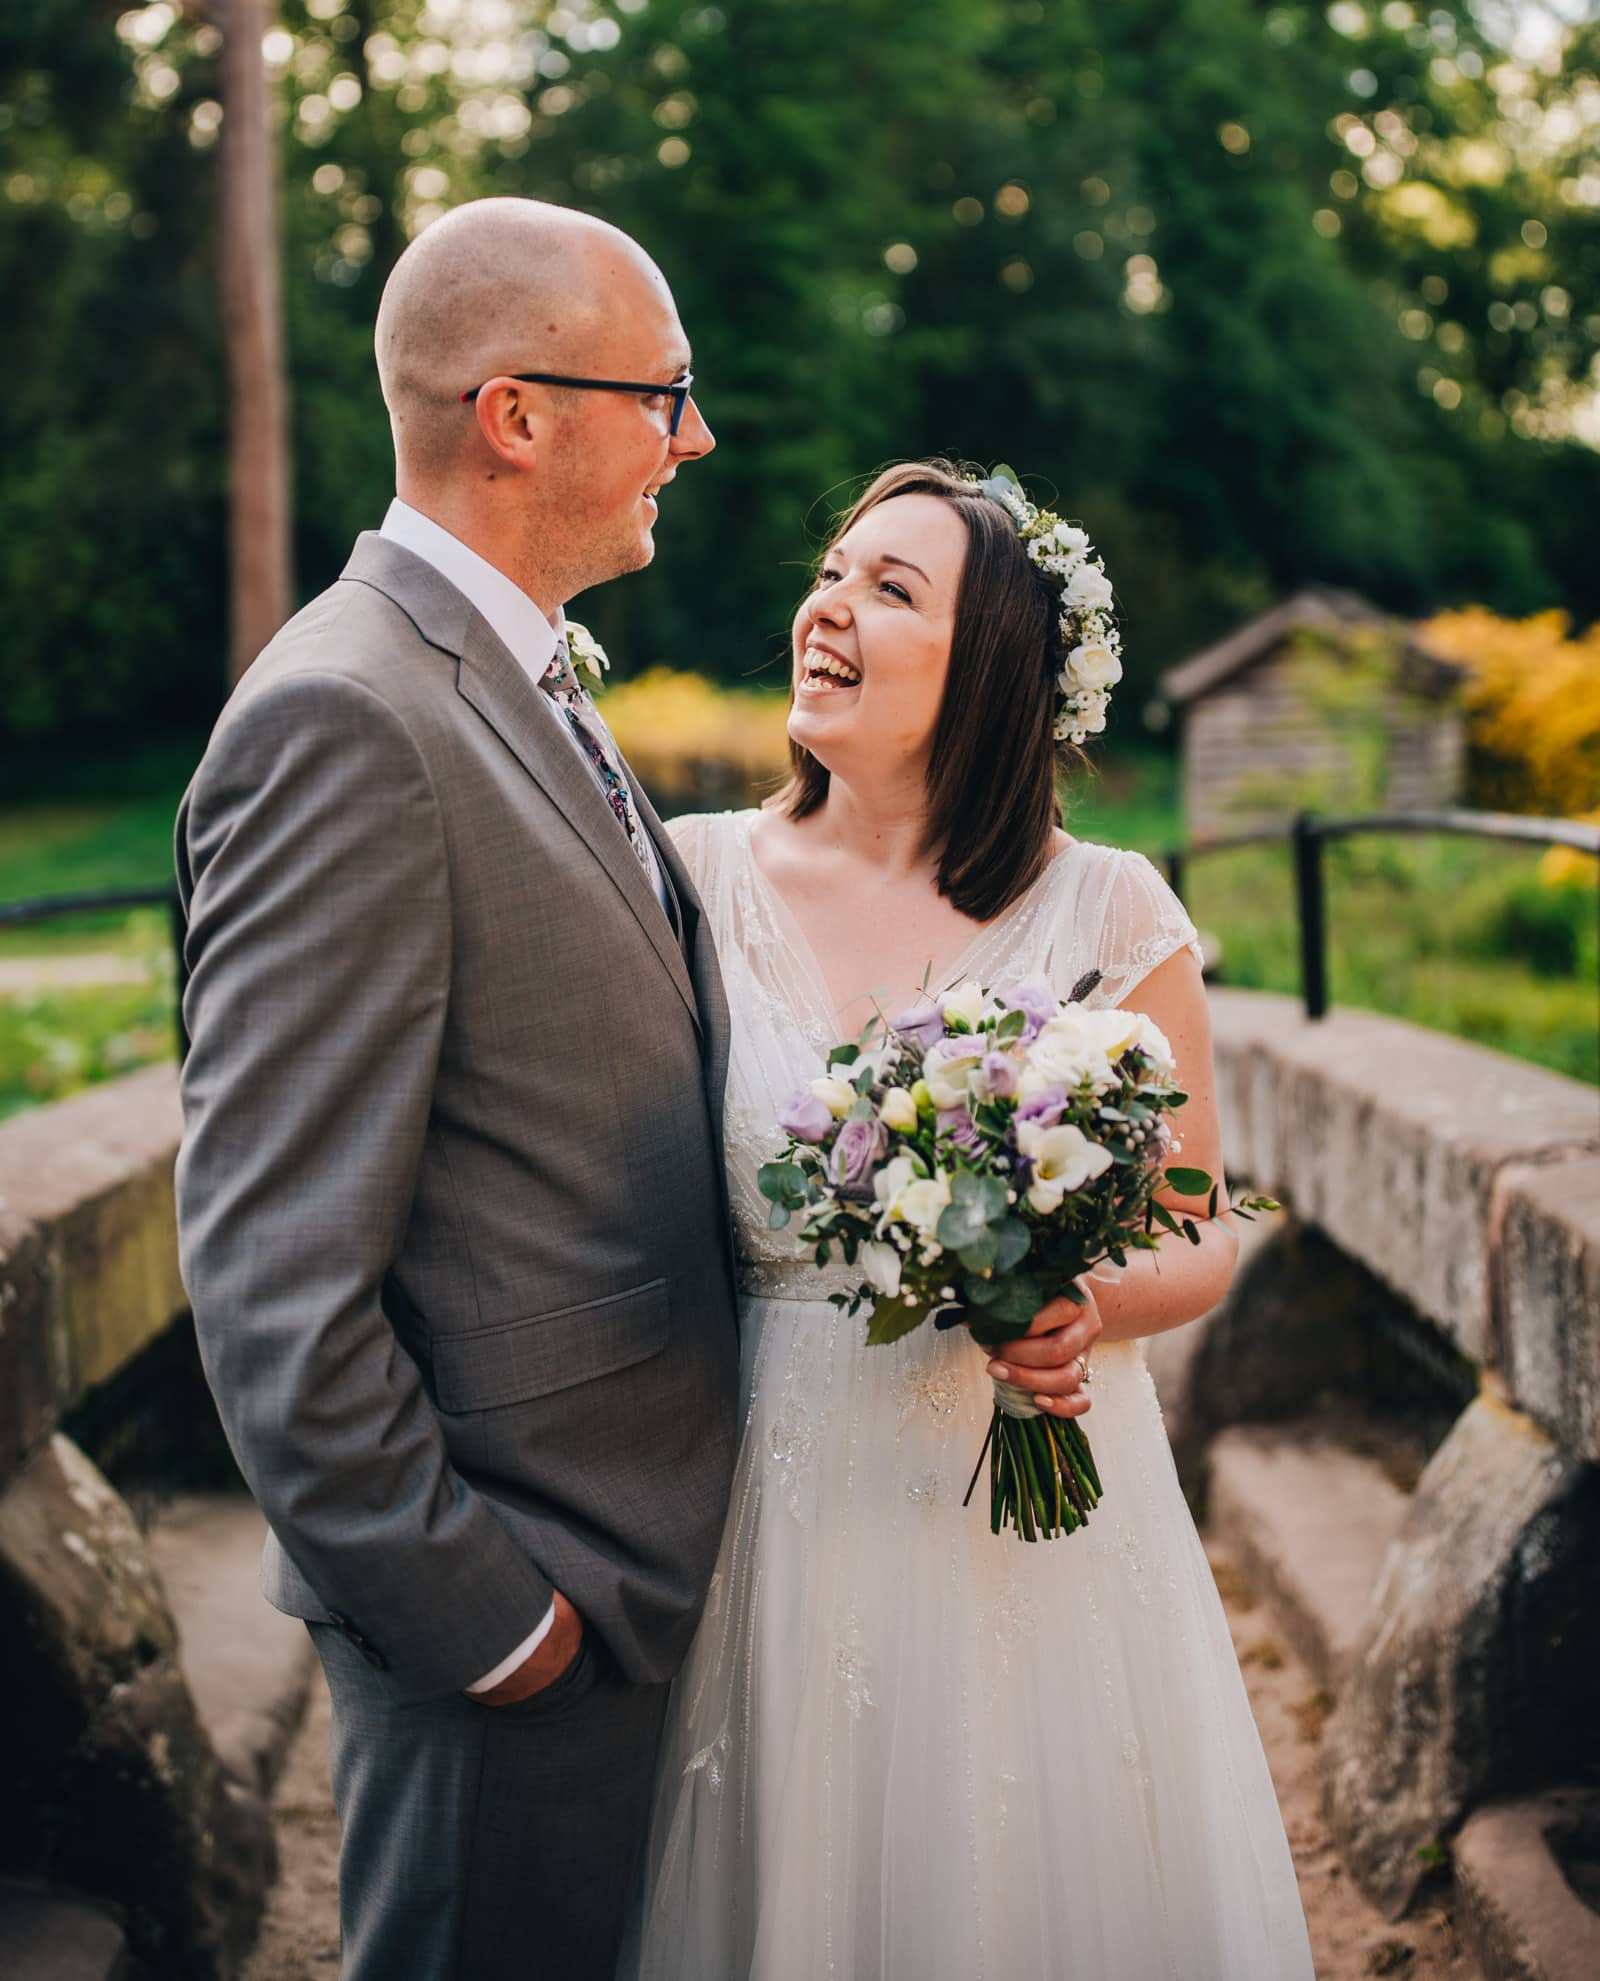 Natural wedding portraits at Quarry Bank Mill